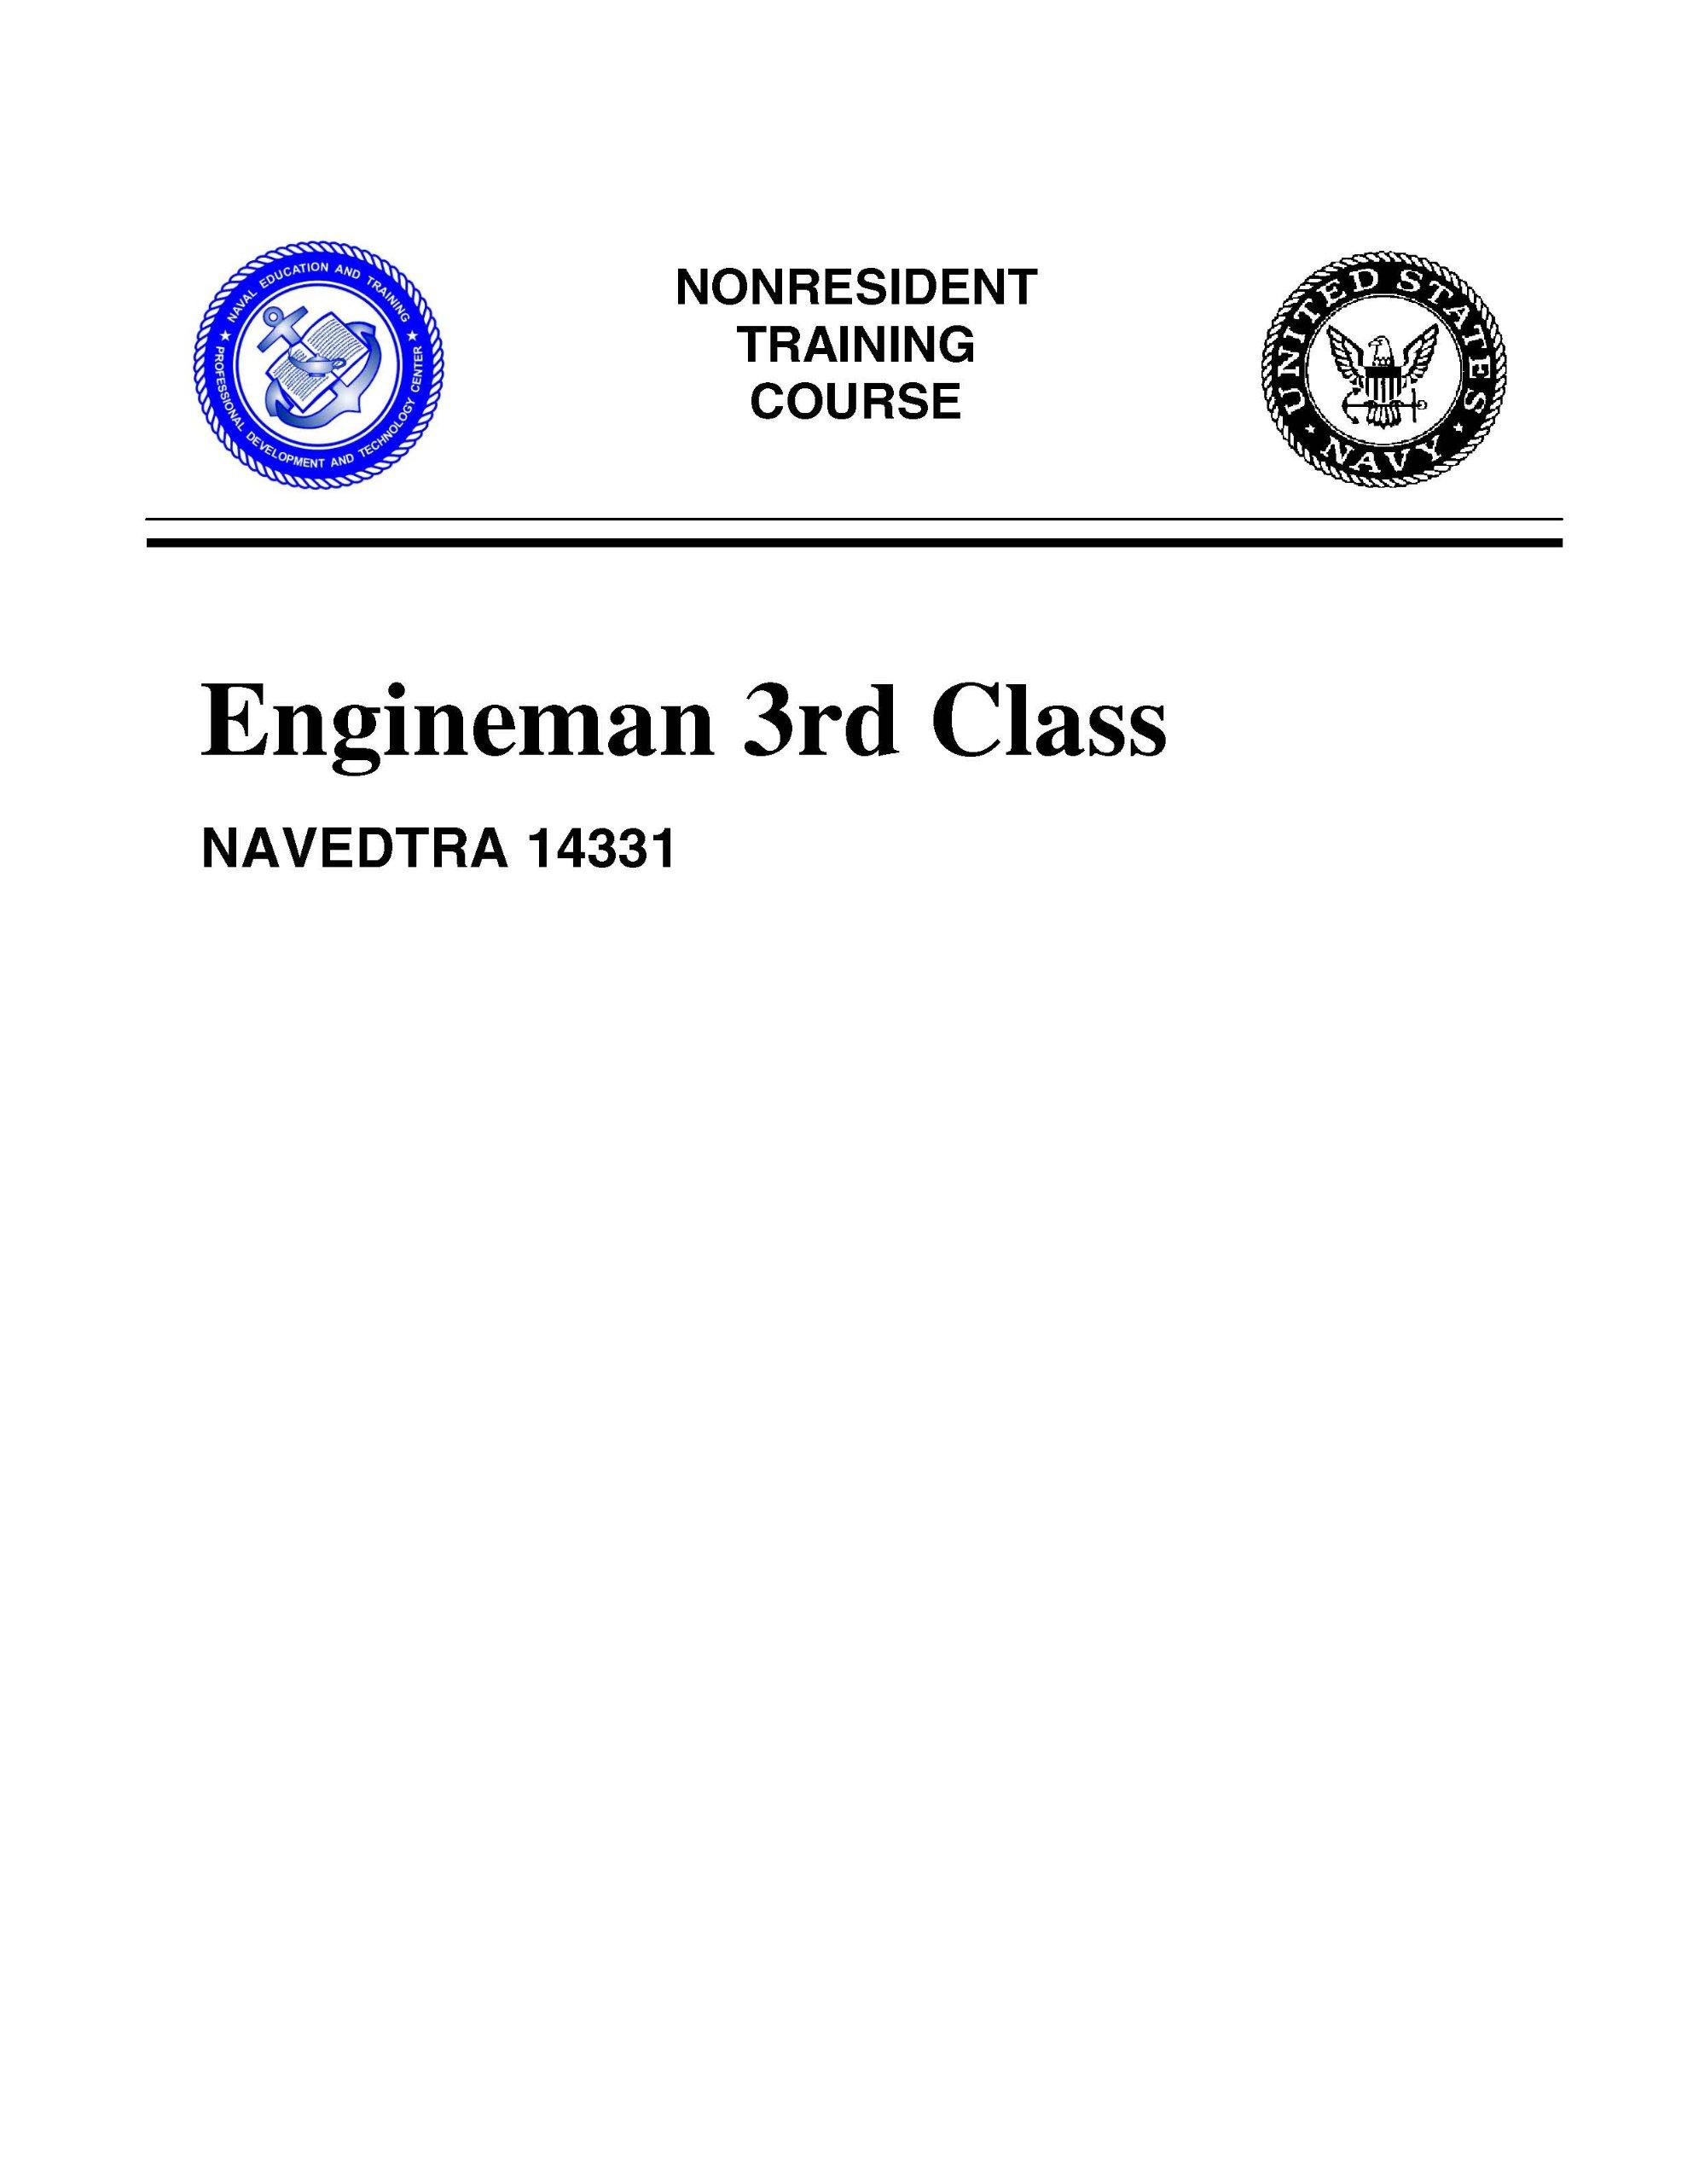 Engineman 3 NAVEDTRA 14331 (Nonresident Training Course) ebook